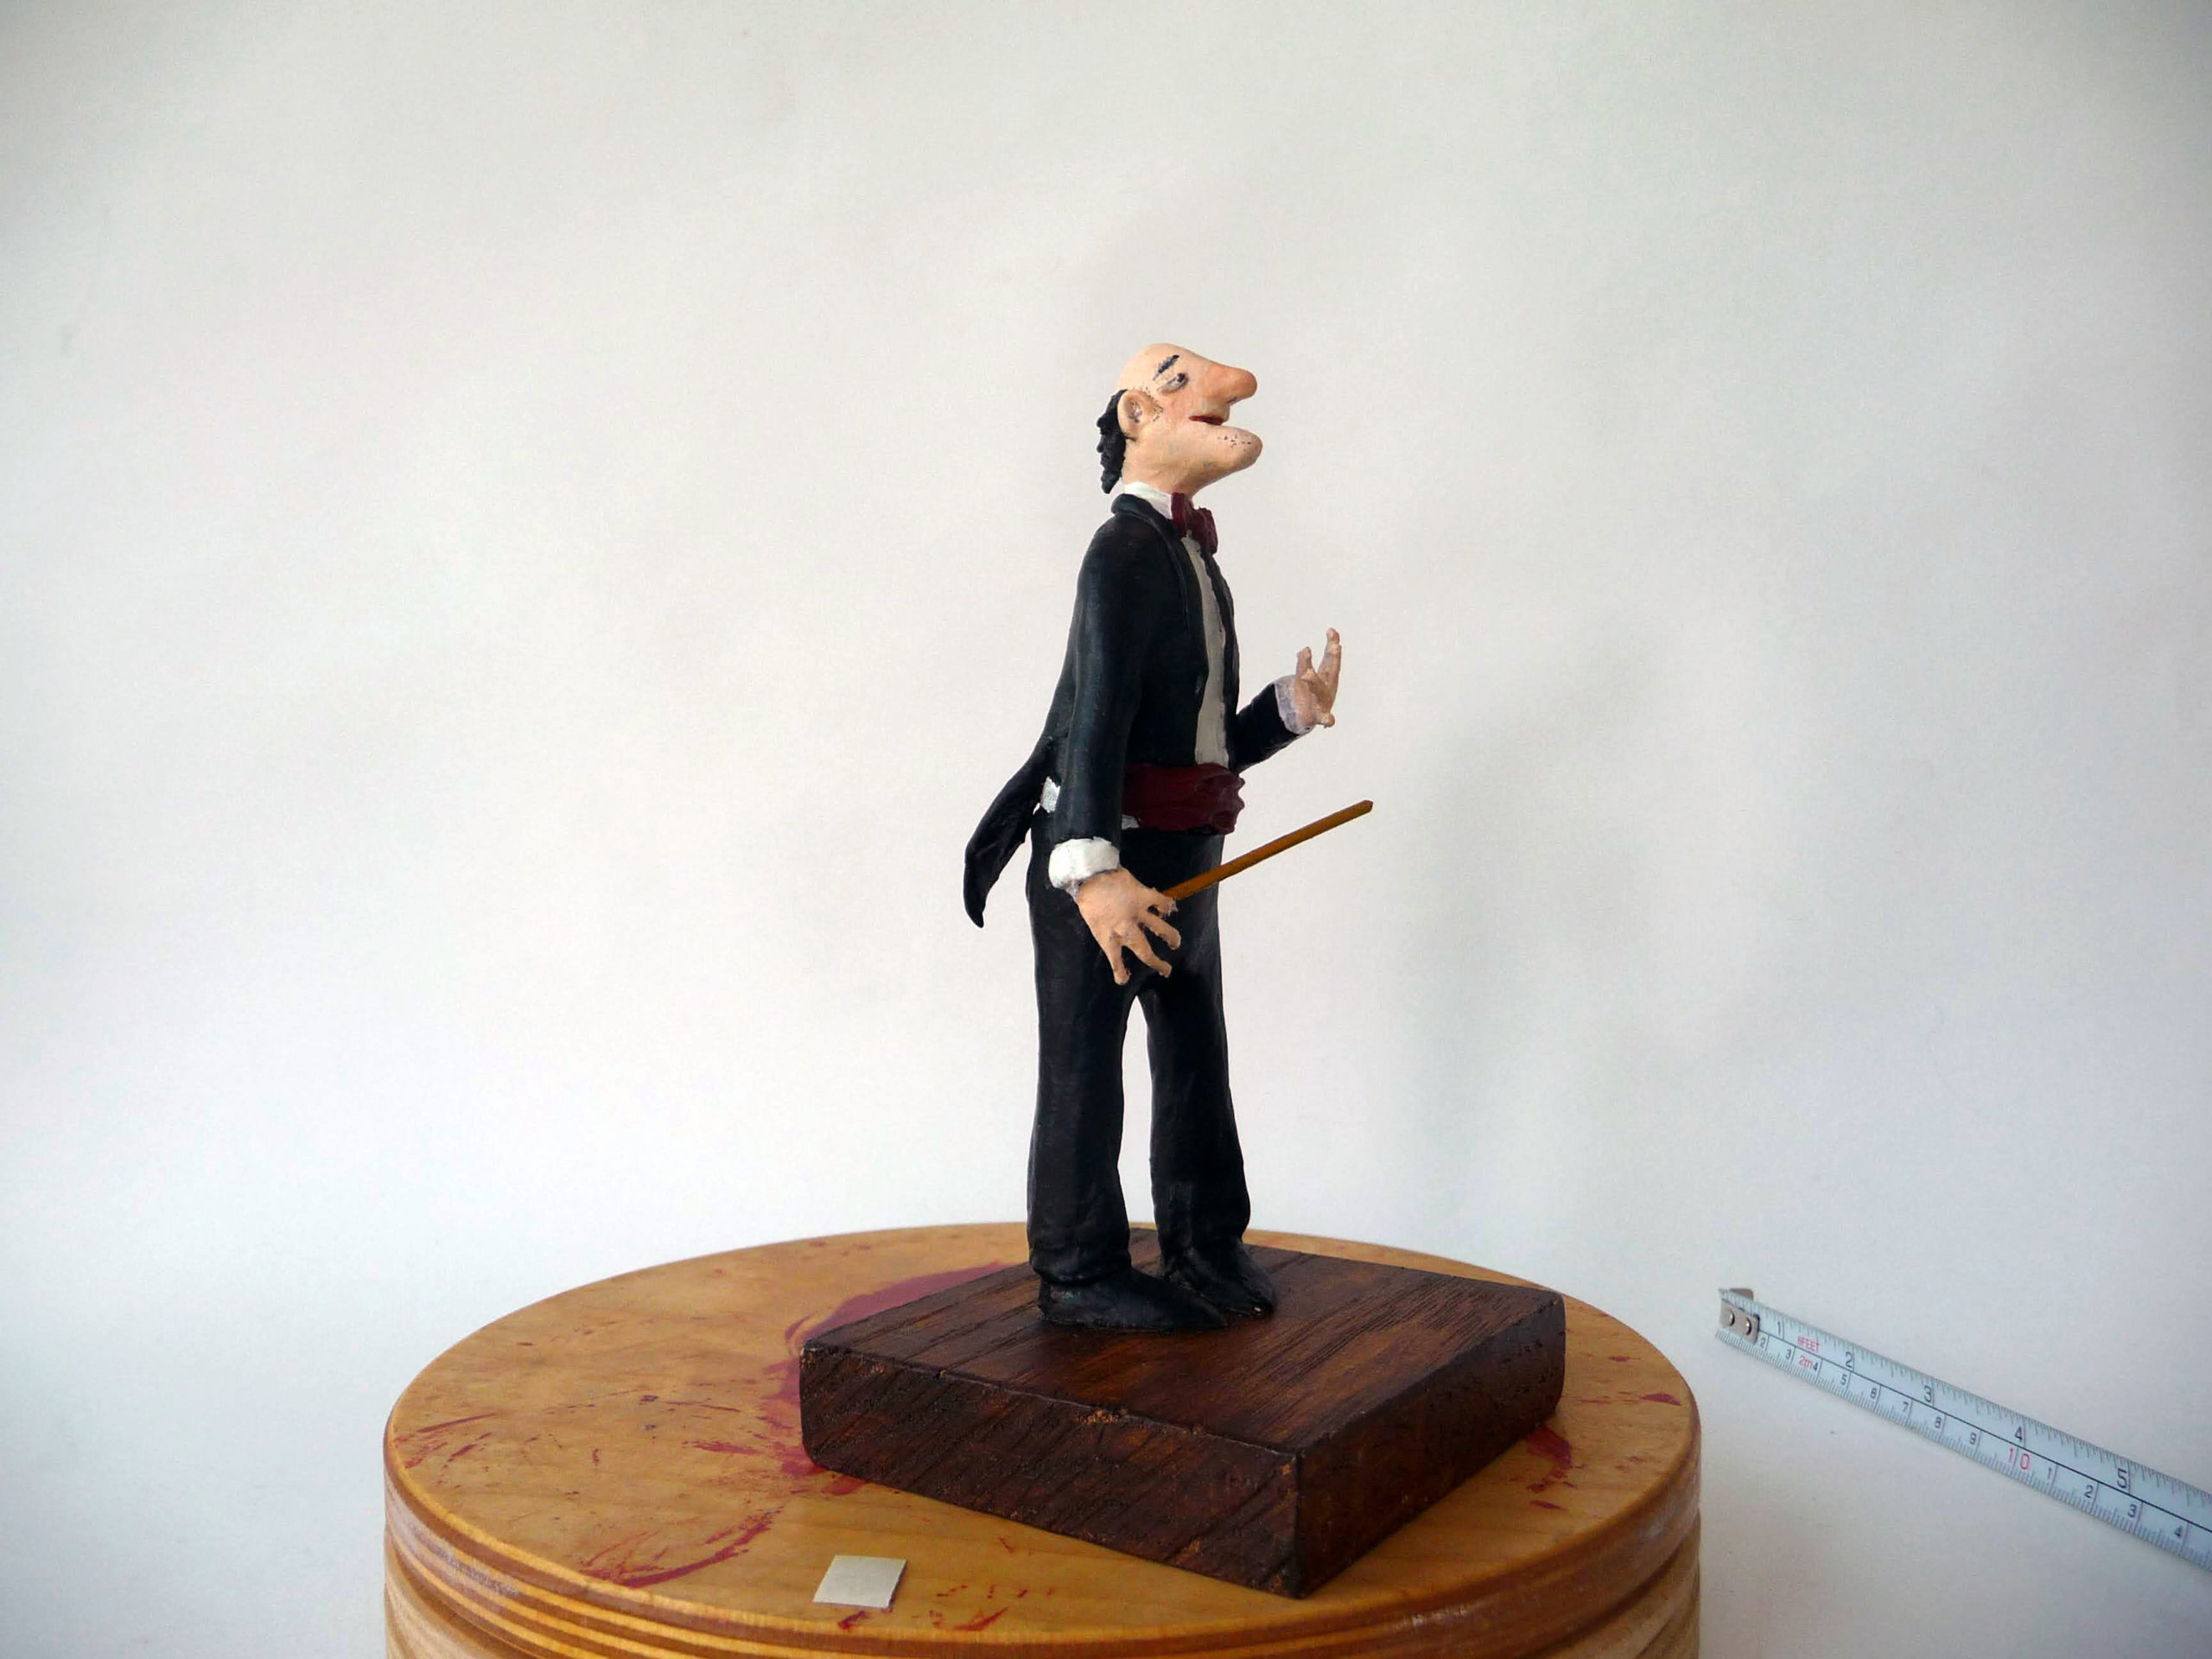 Dirigentje